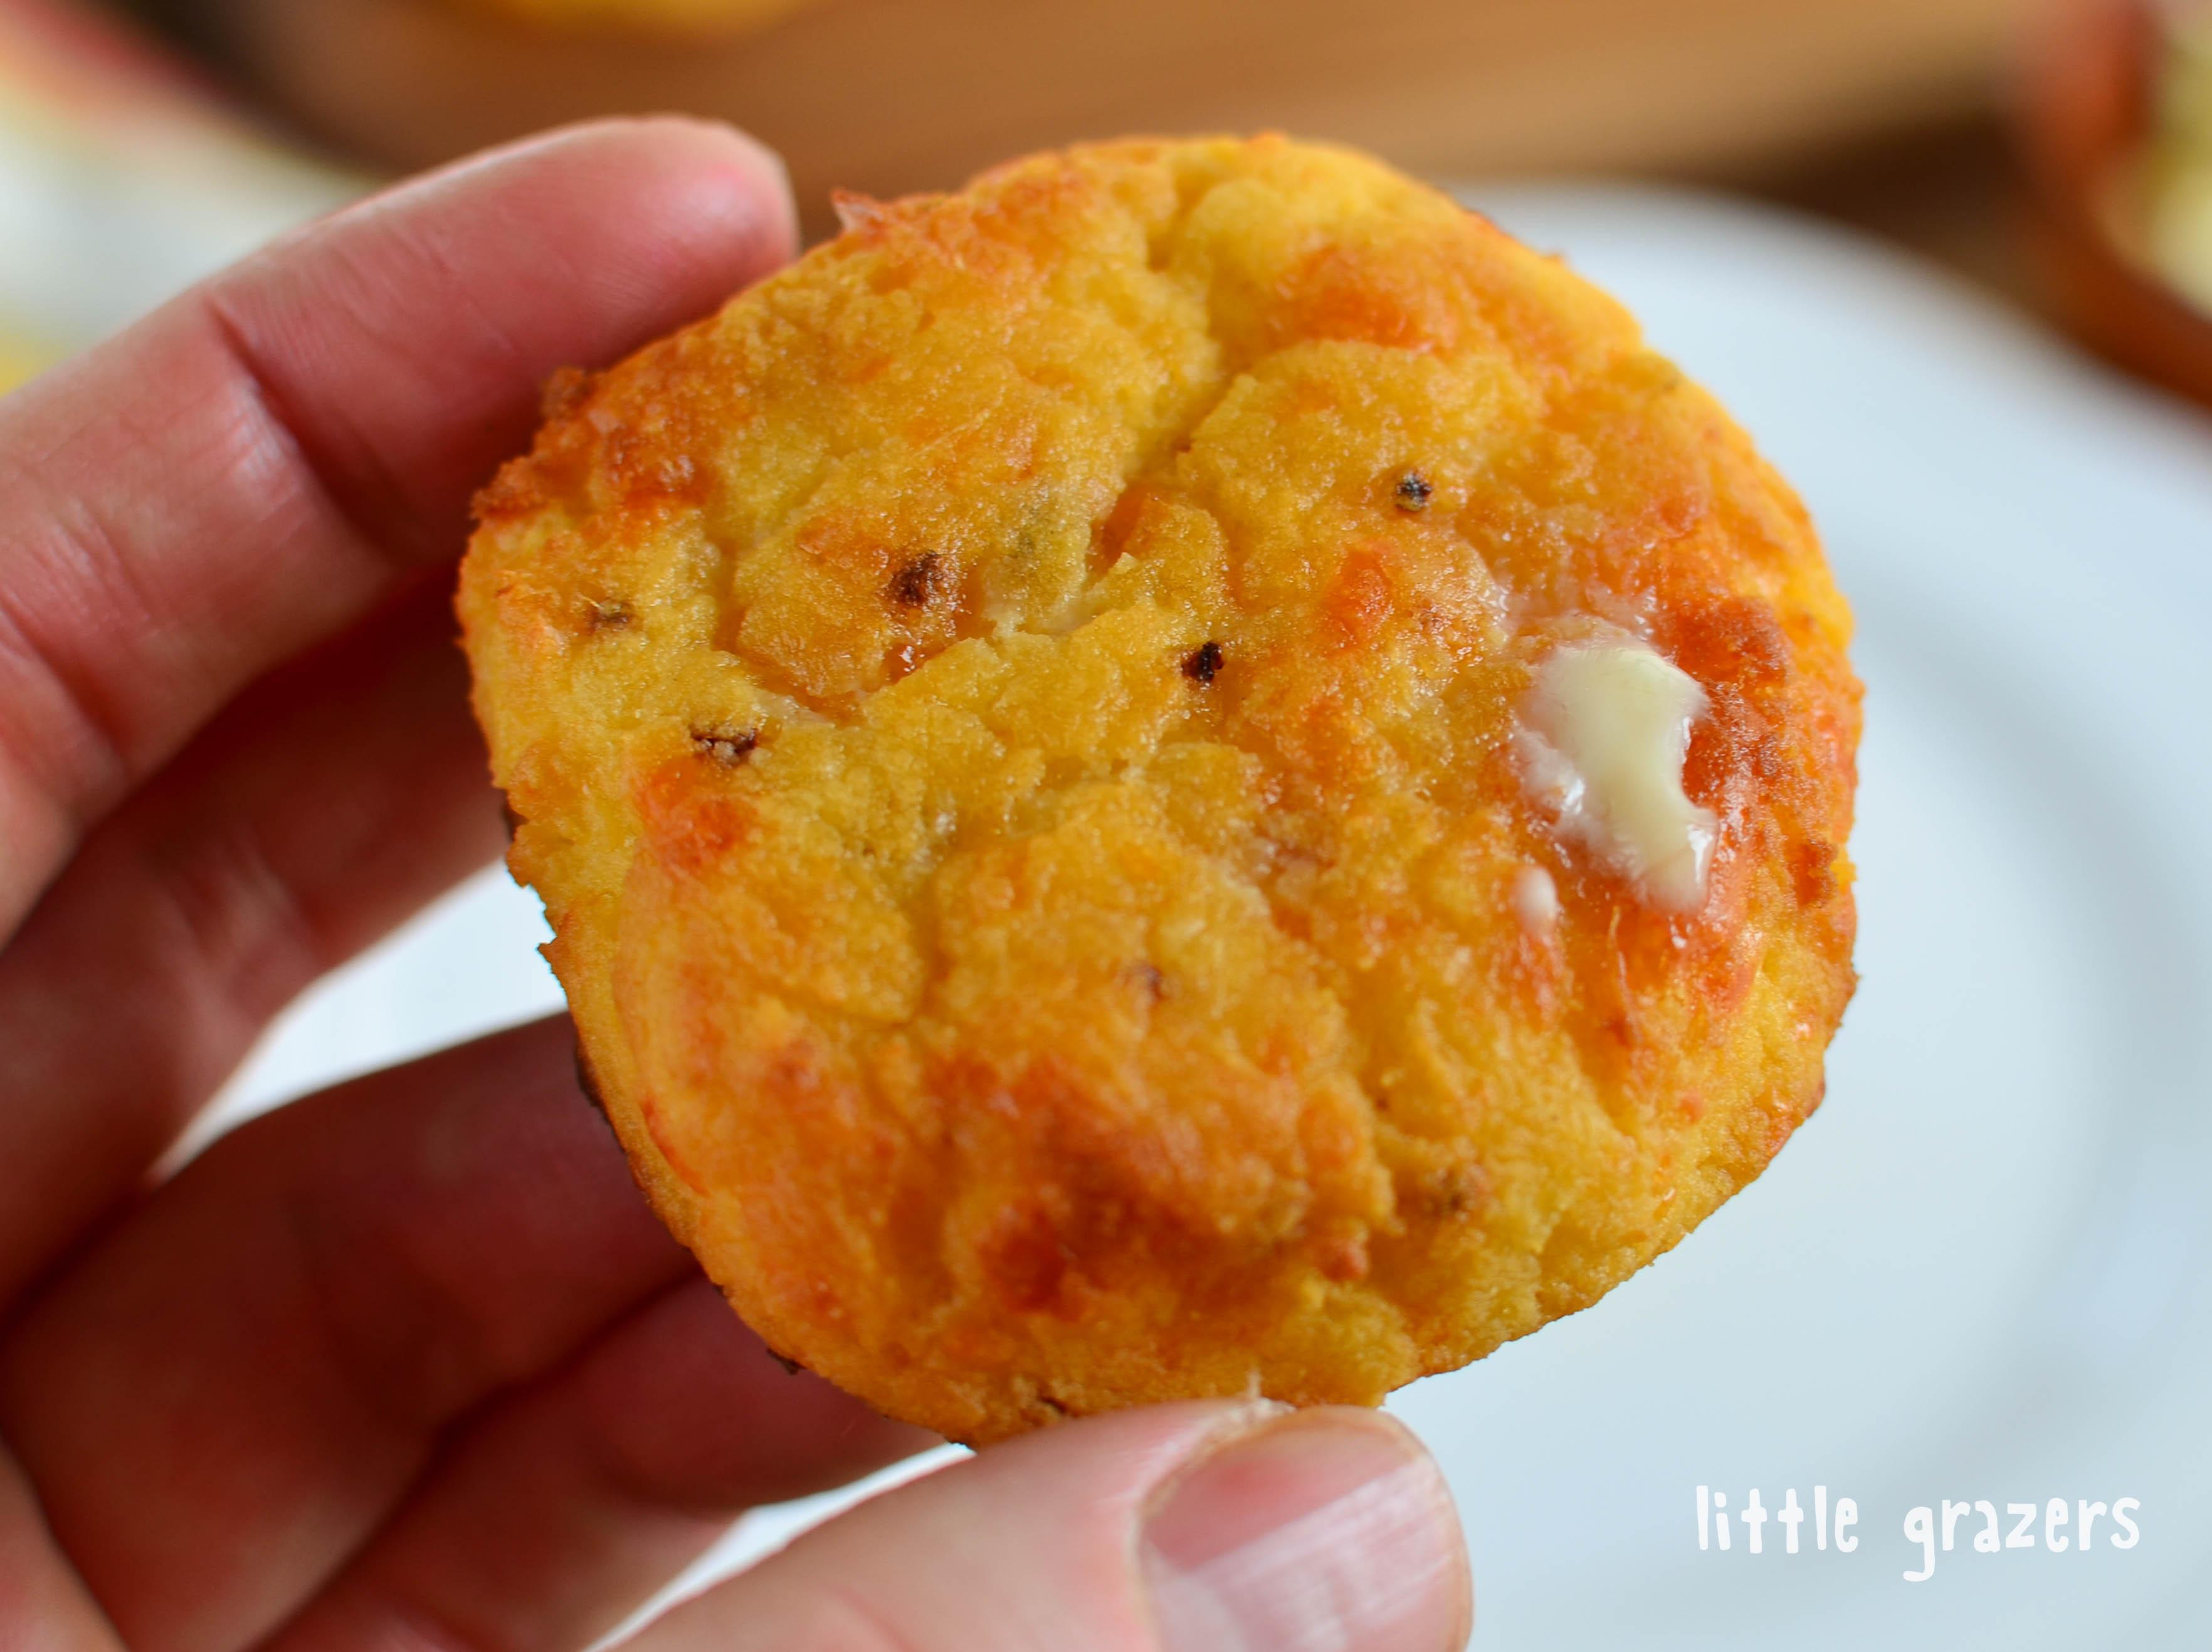 Little Grazers Cheddar Sweet Potato Scones - Gluten Free, Baby Led Weaning, Finger Foods